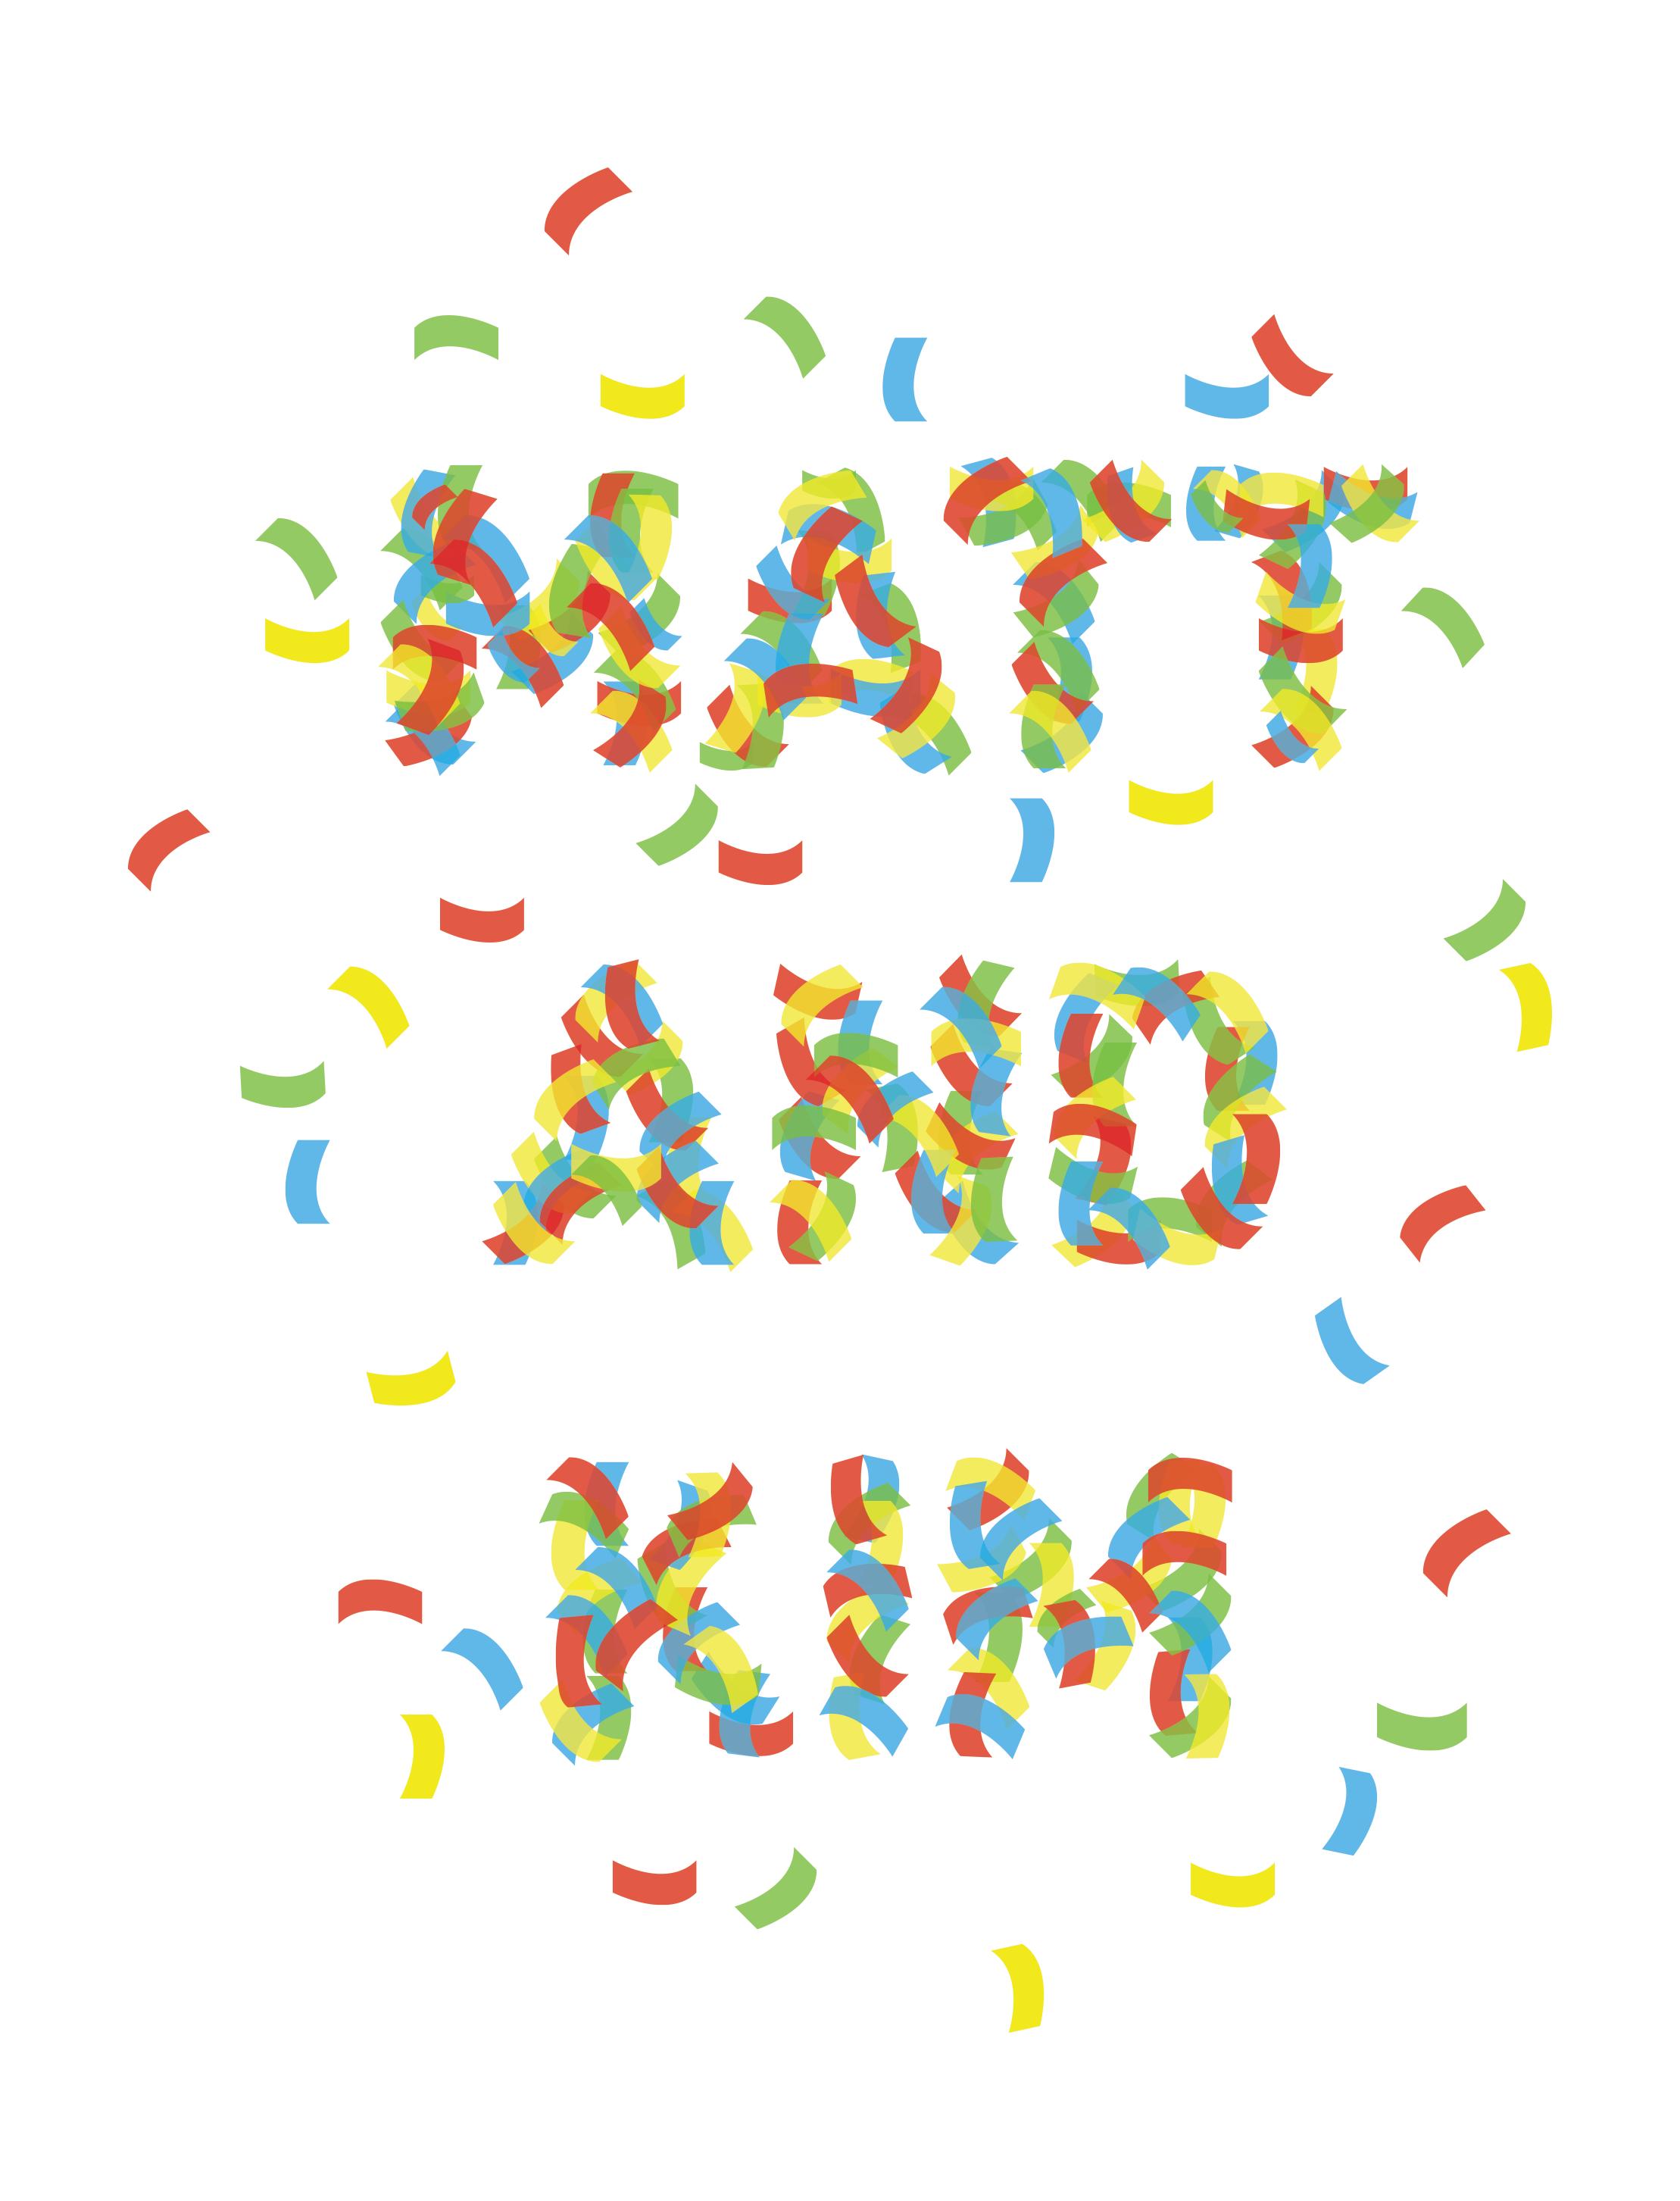 Matt & Kim - image 4 - student project